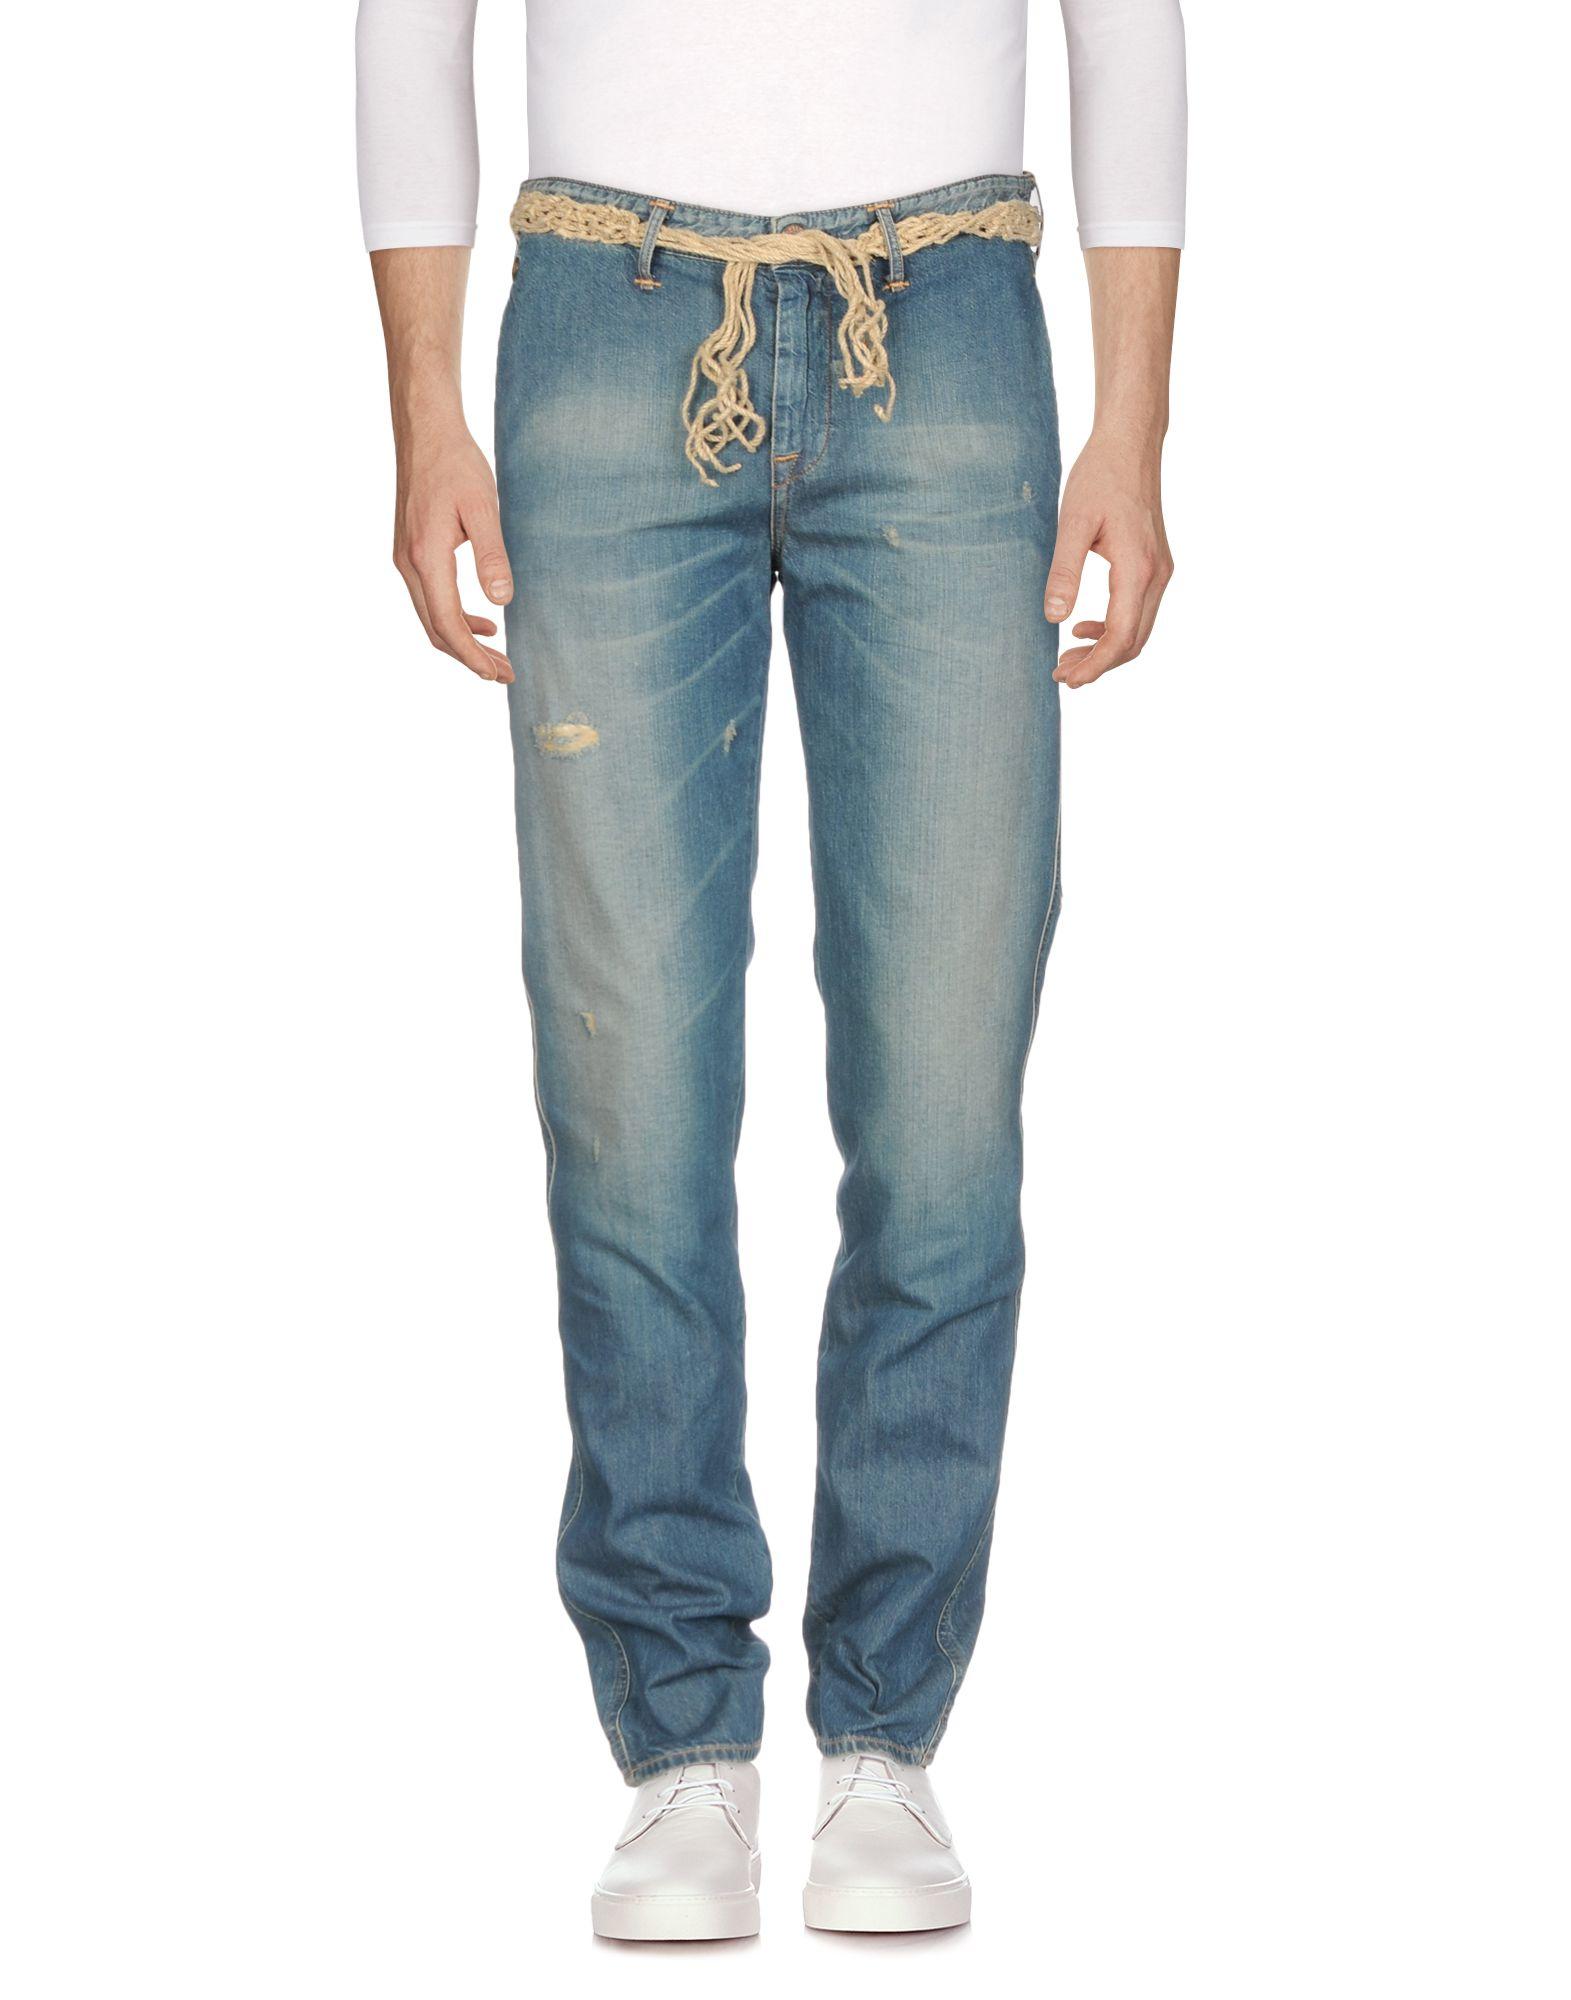 Pantaloni Jeans Coast Weber & Ahaus Donna - Acquista online su